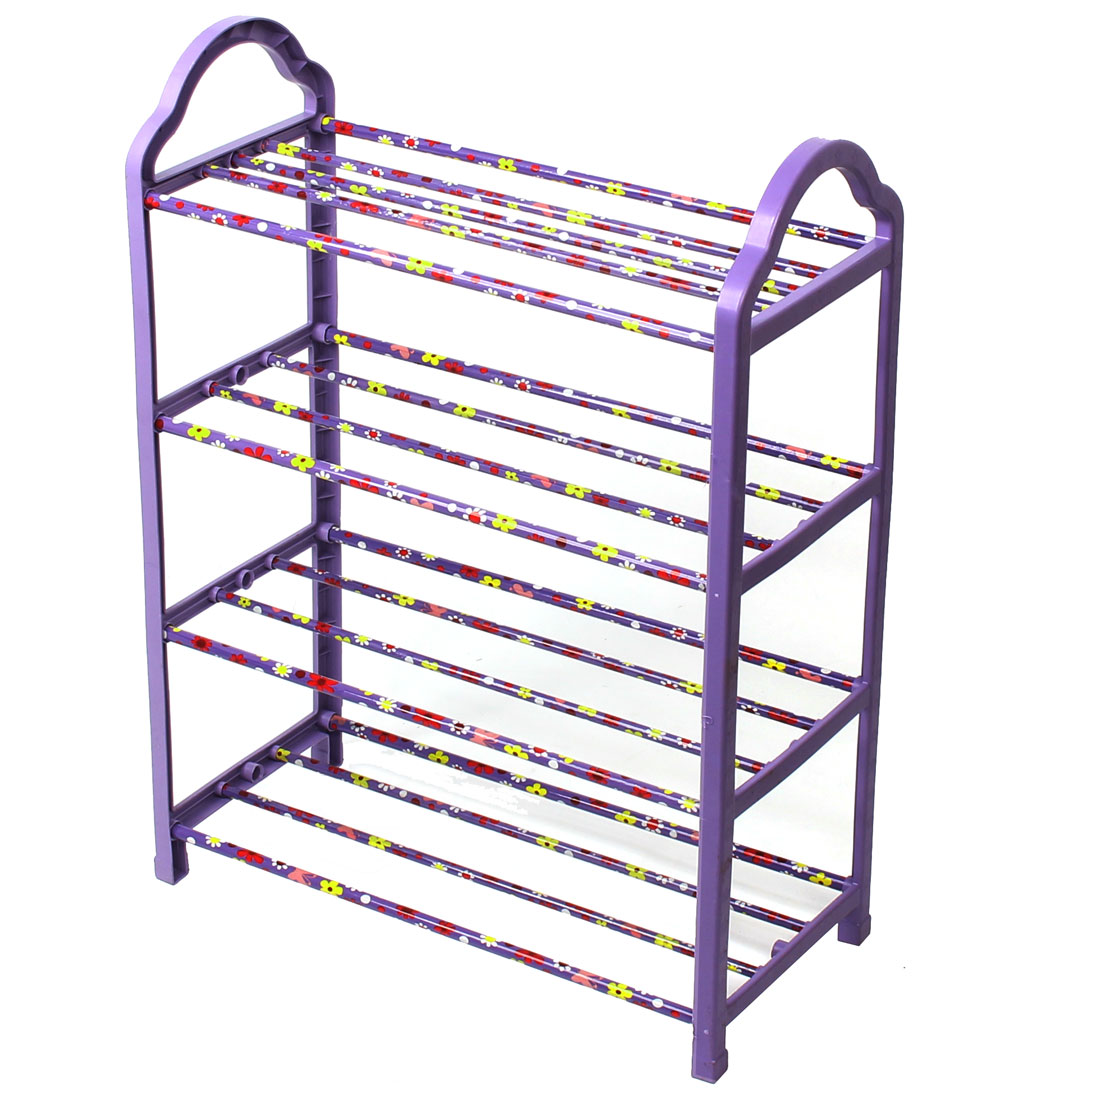 Household Plastic 4 Layers Detachable Storage Organizer Holder Shelf Shoes Rack Purple